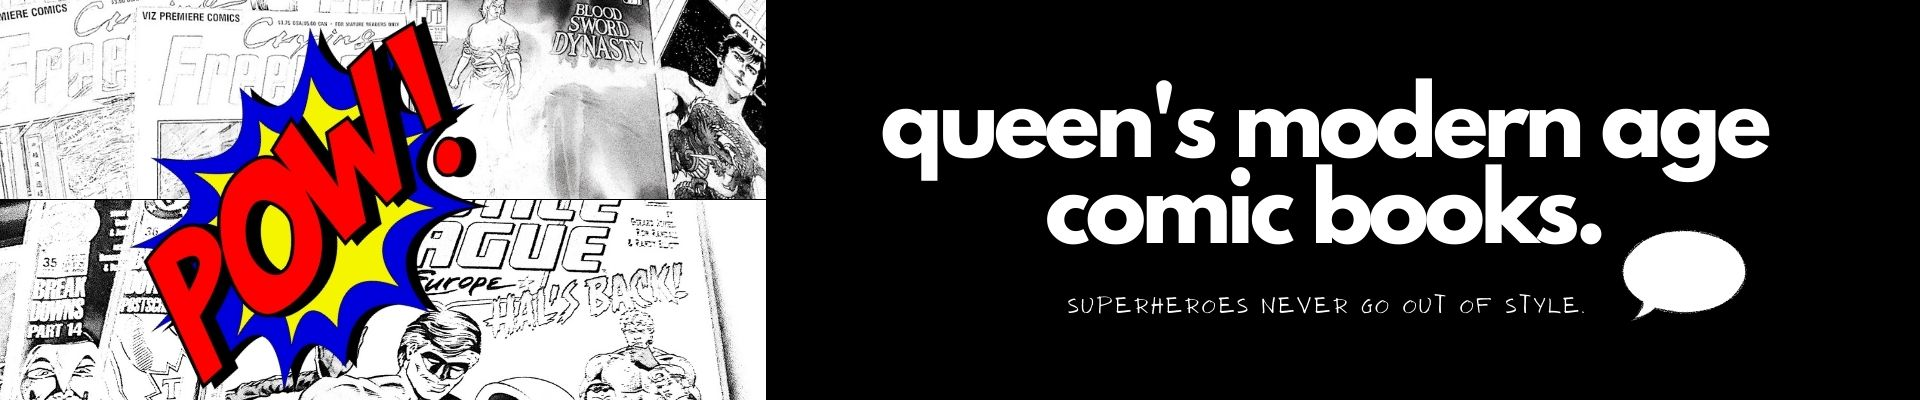 Queen's Modern Age Comic Books